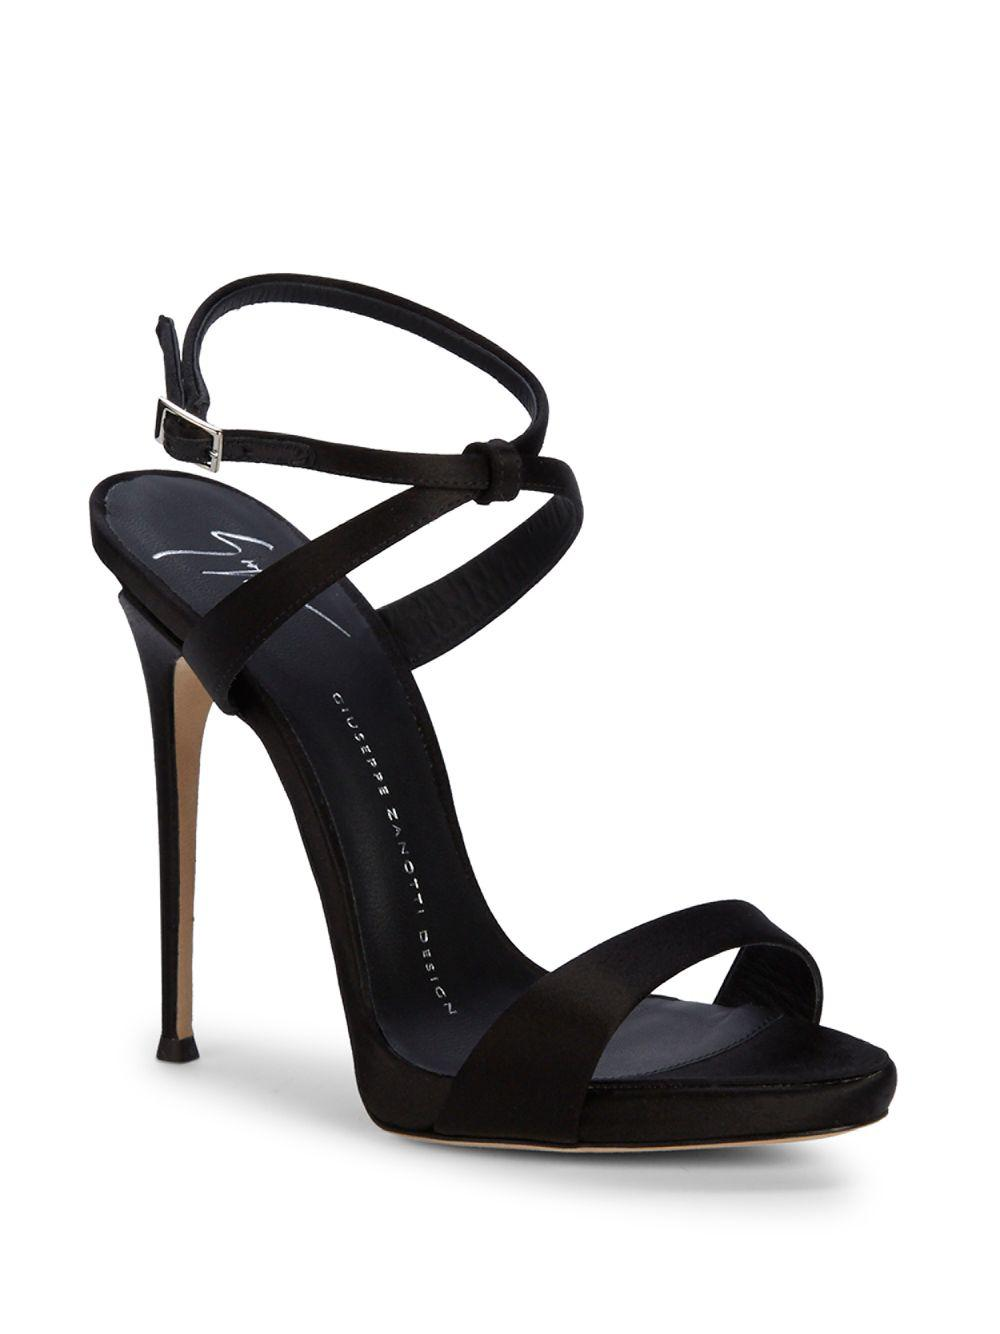 bc5cb8f01a Giuseppe Zanotti Embellished Heel X-cross Sandals in Black - Lyst